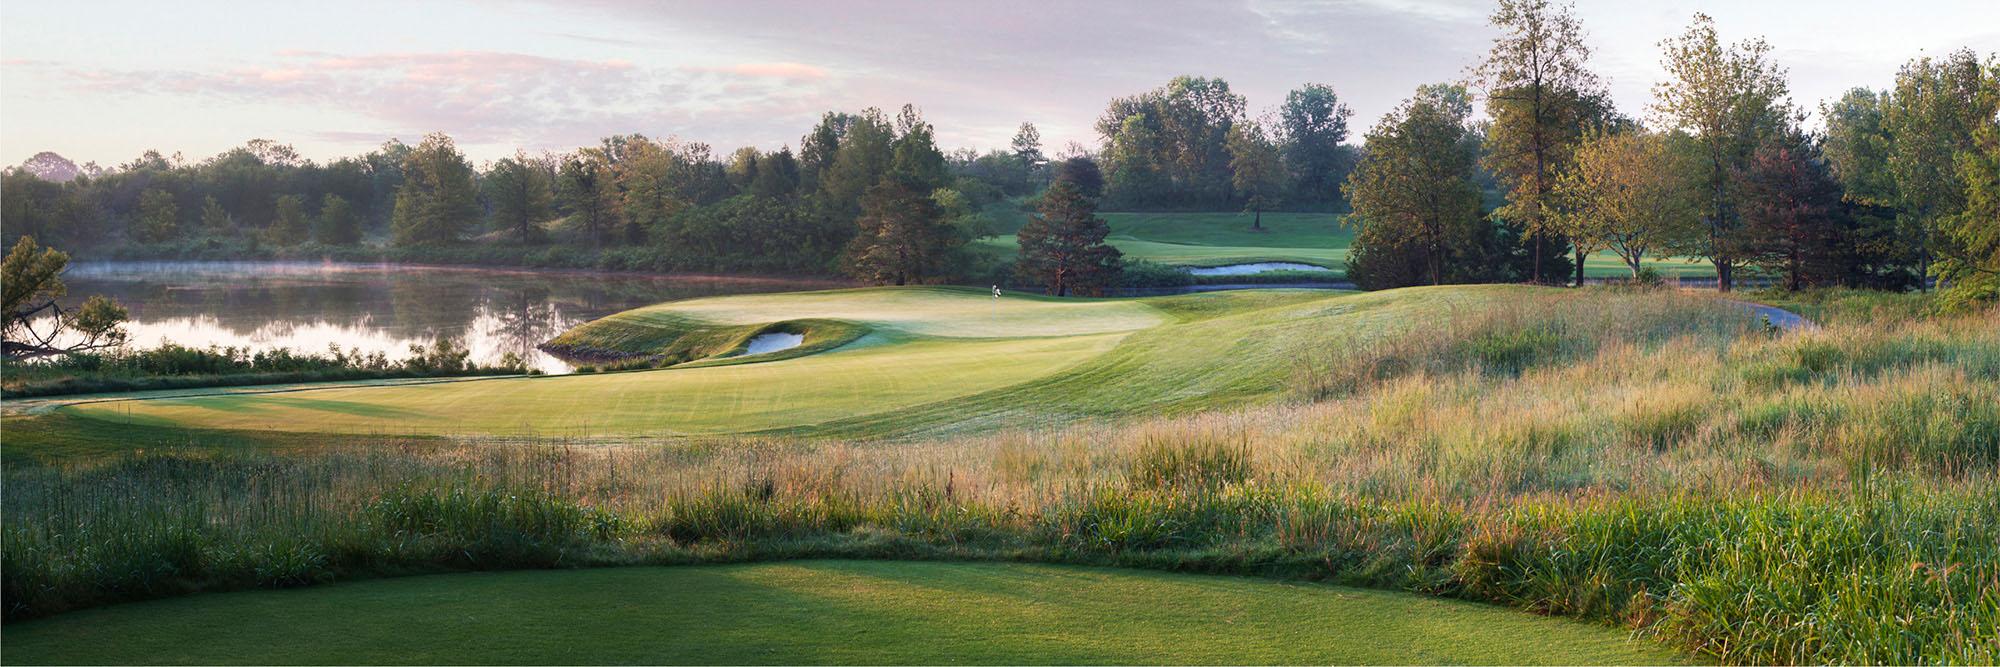 Golf Course Image - Flint Hills National Golf Club No. 17